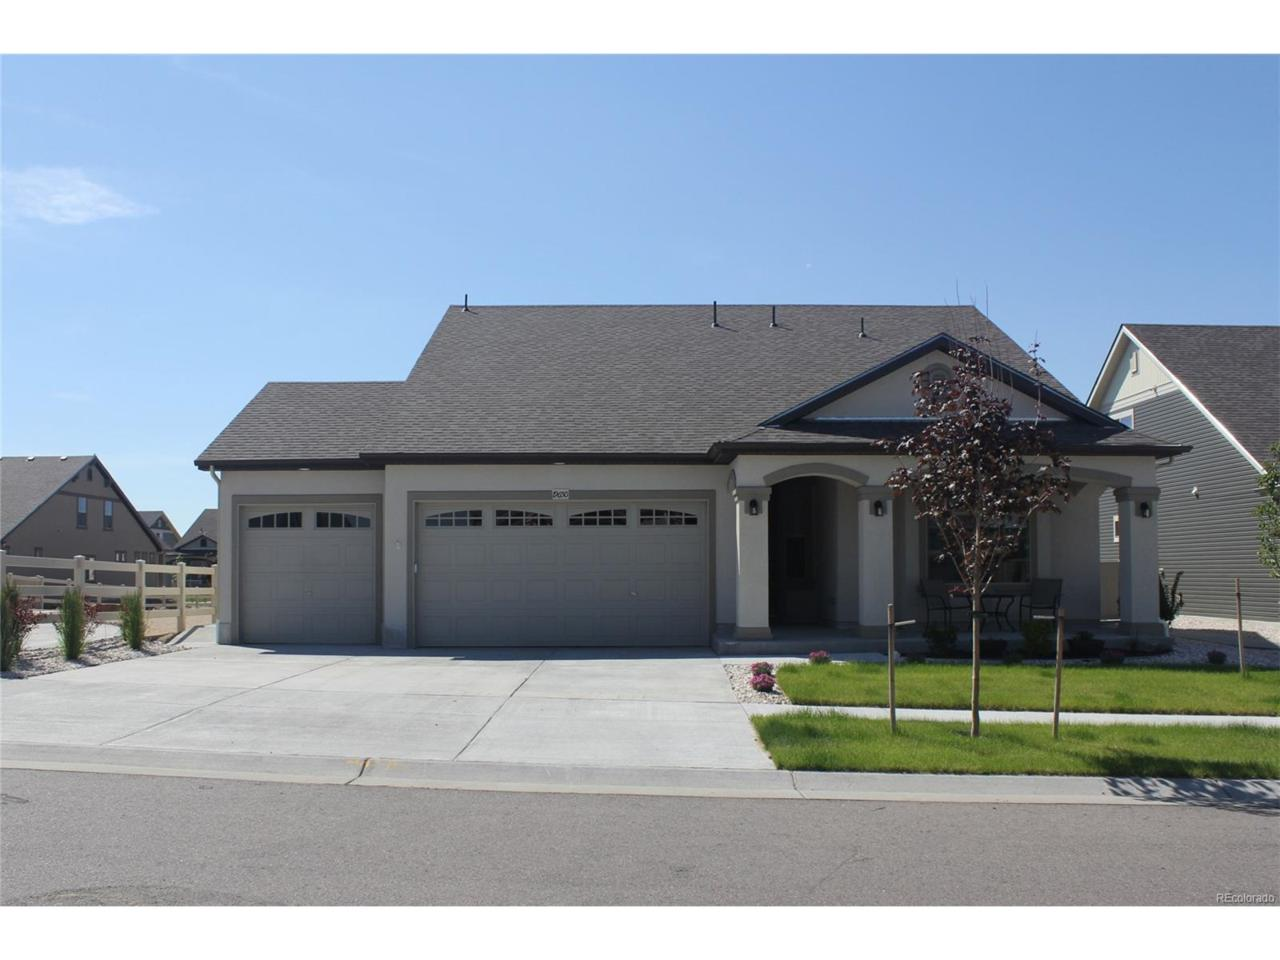 19650 E 53rd Avenue, Denver, CO 80249 (MLS #5705640) :: 8z Real Estate